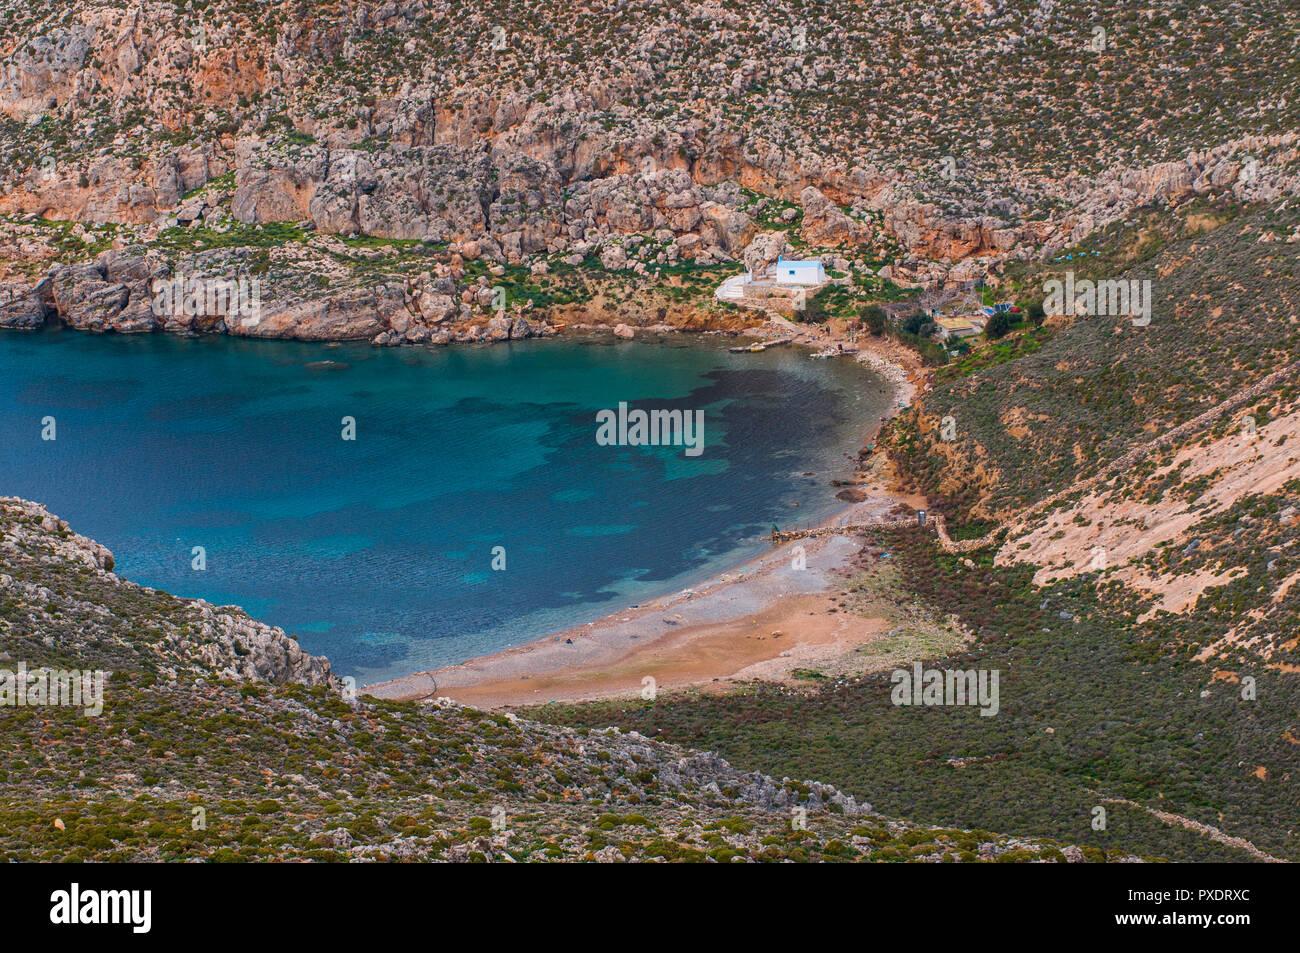 europe, greece, dodecanese, kalymnos, island, emborios - Stock Image